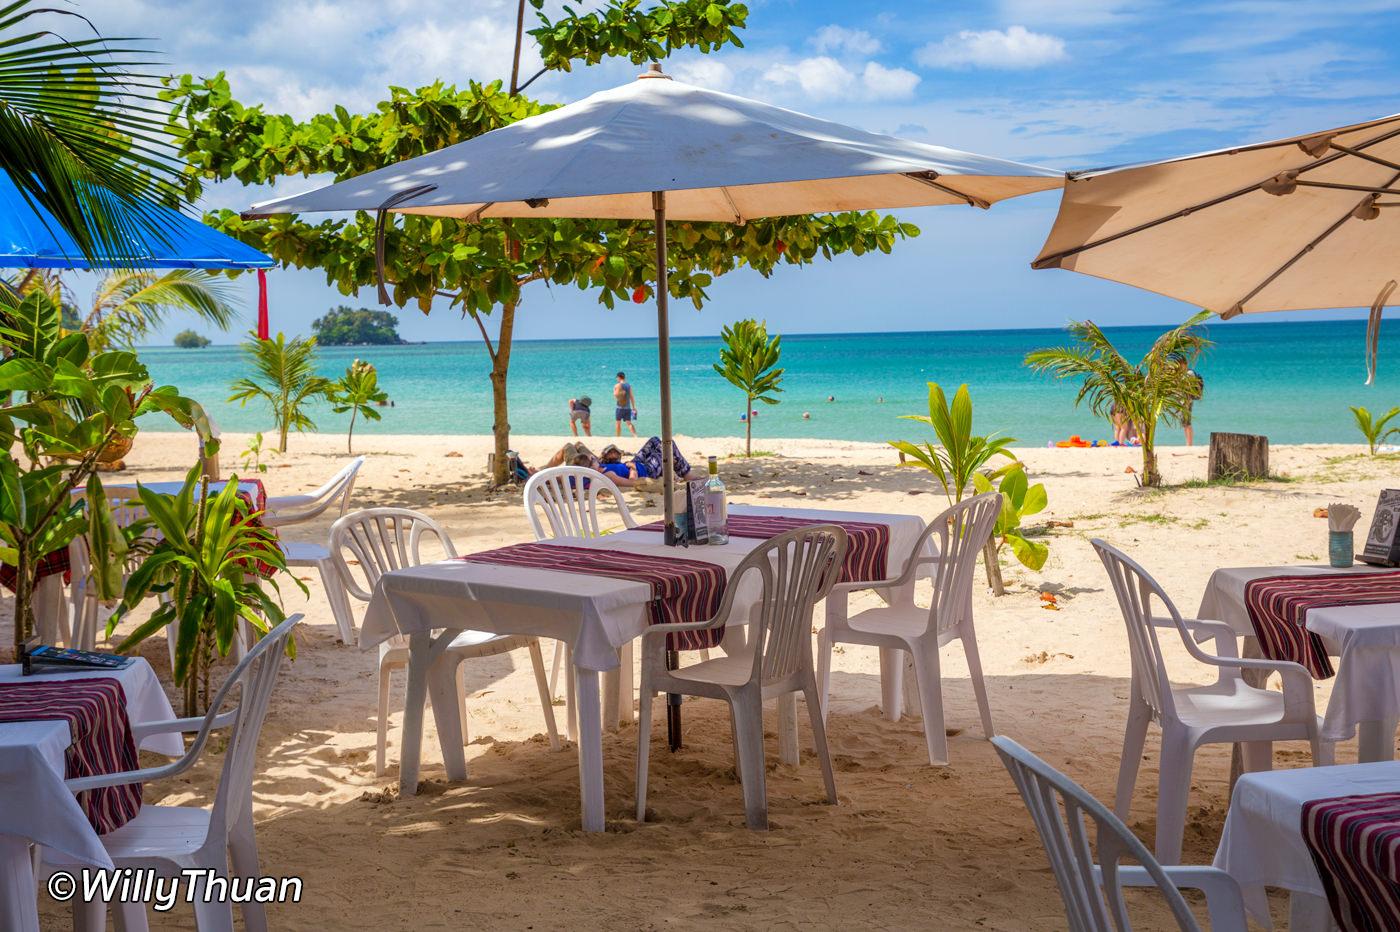 Sea Almond Restaurant on Nai Yang Beach